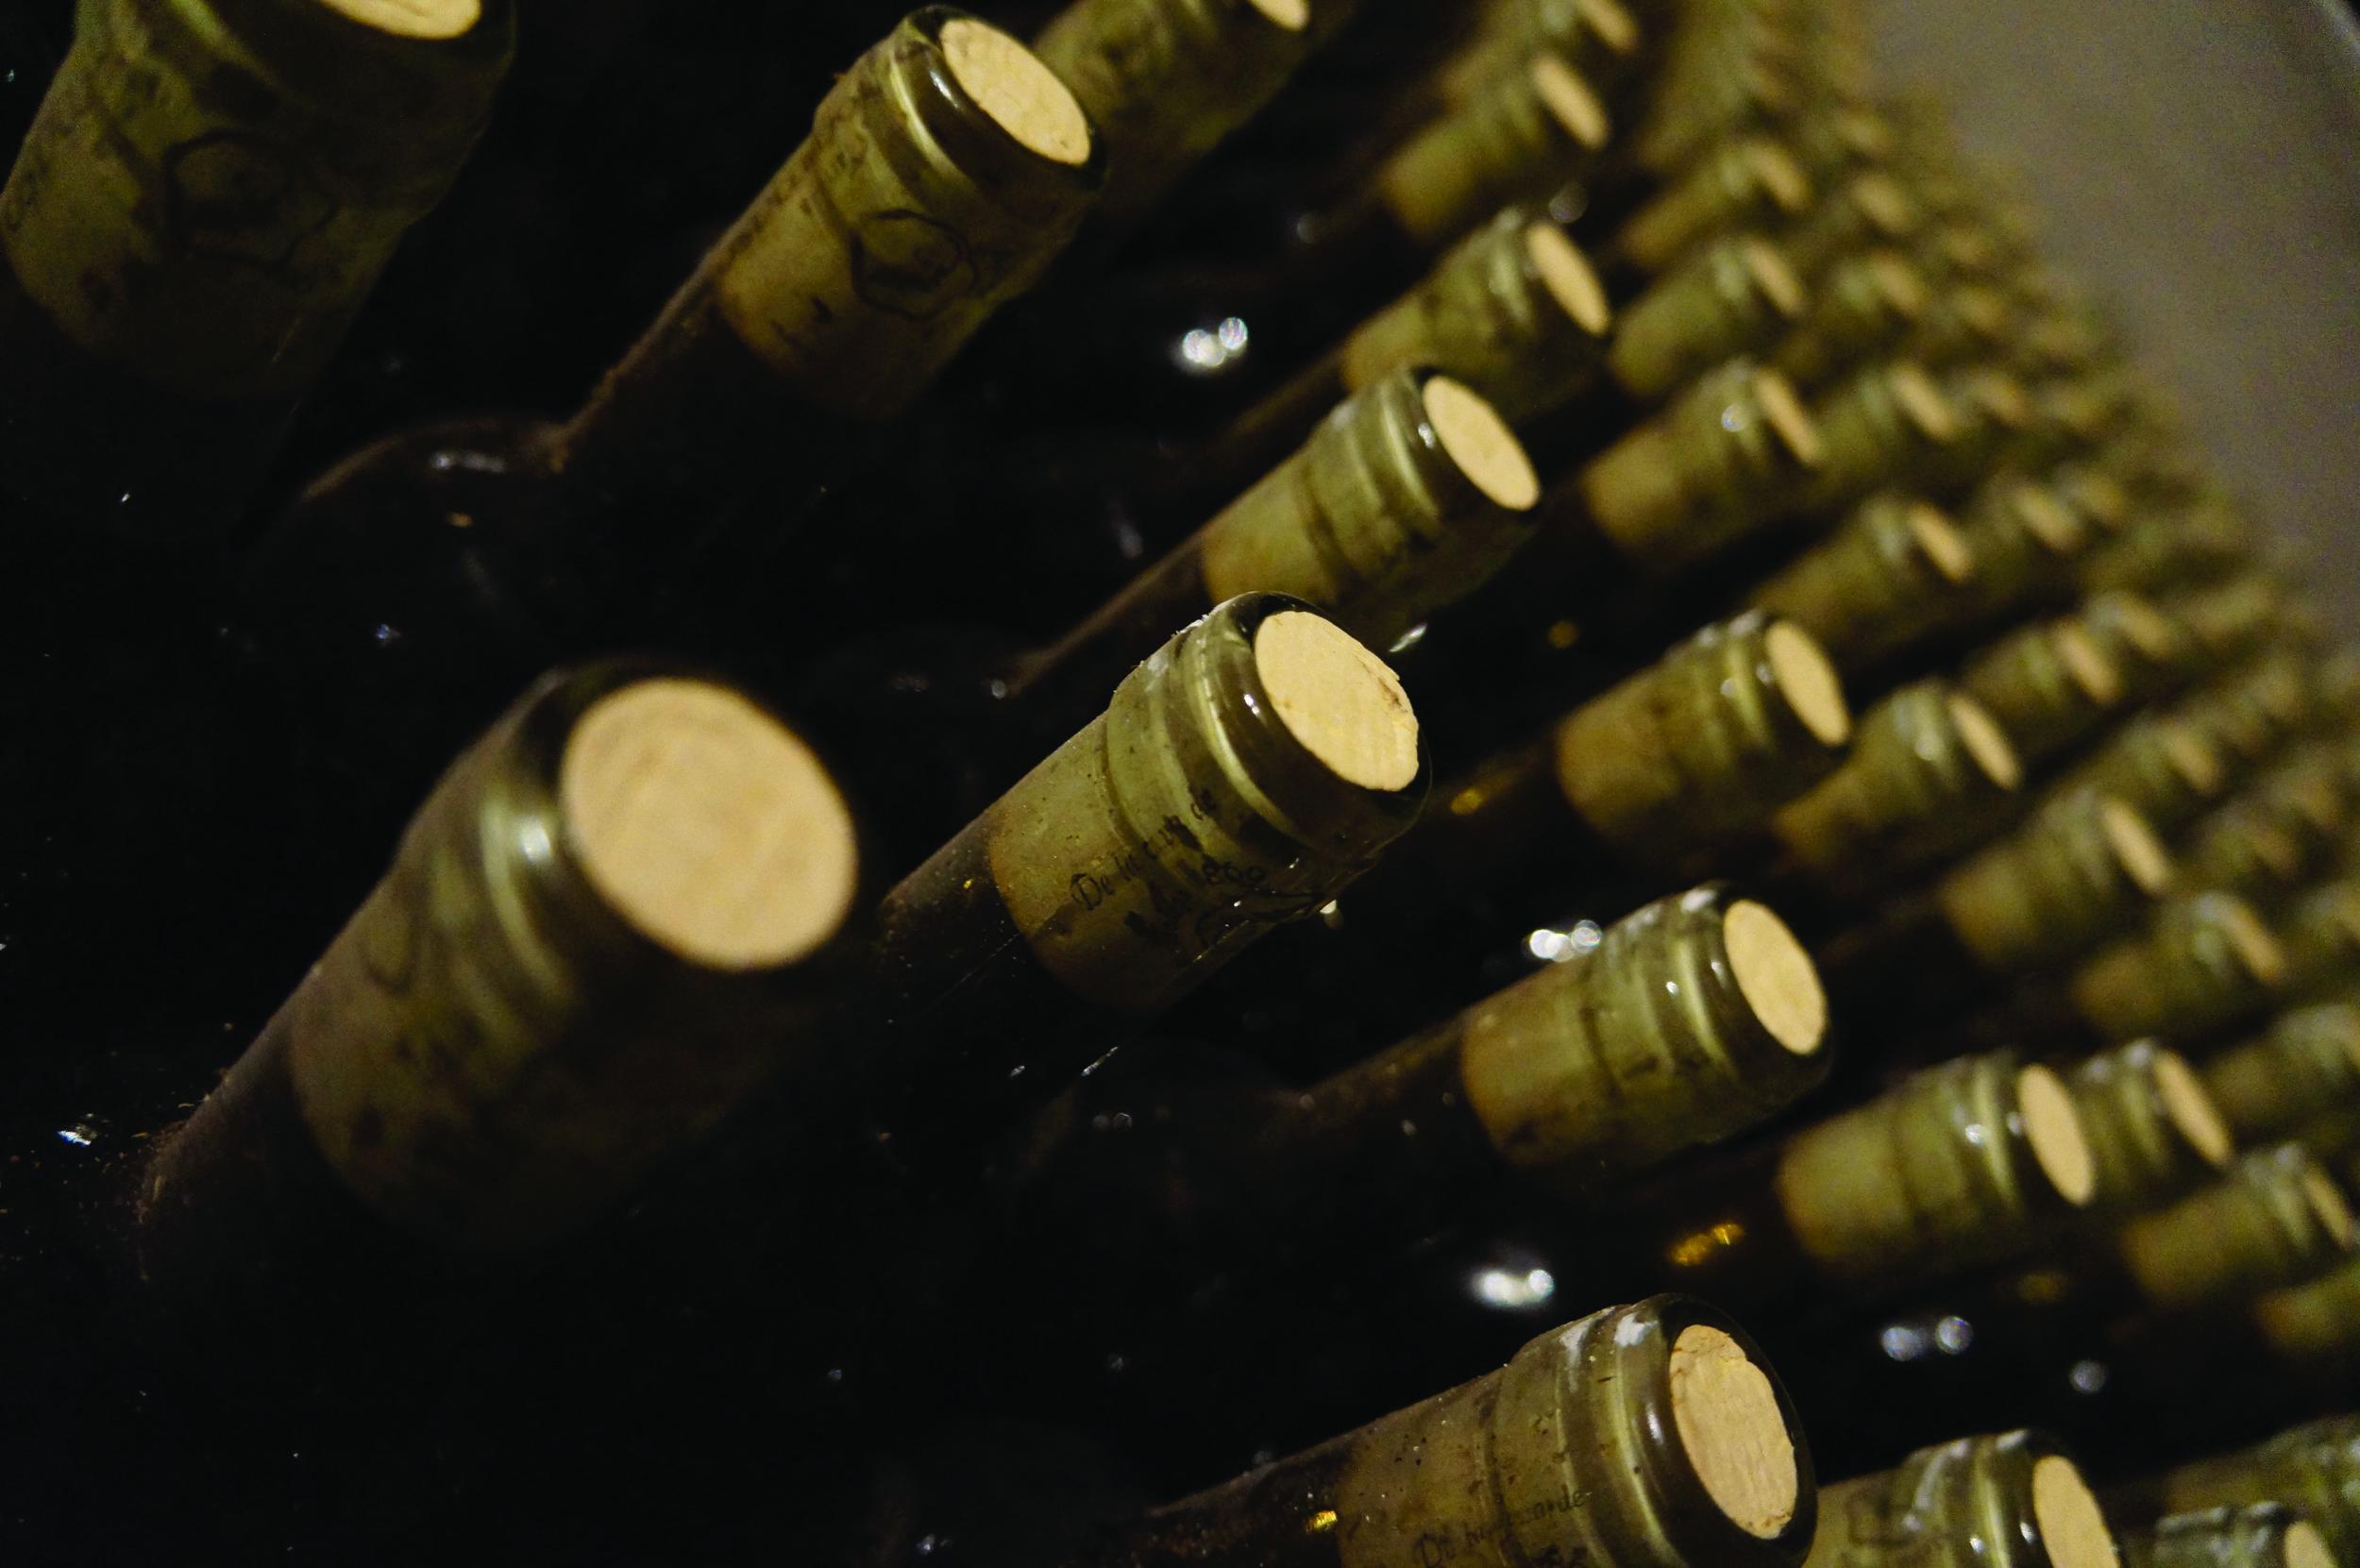 alcoholic-beverage-bottles-774454.jpg